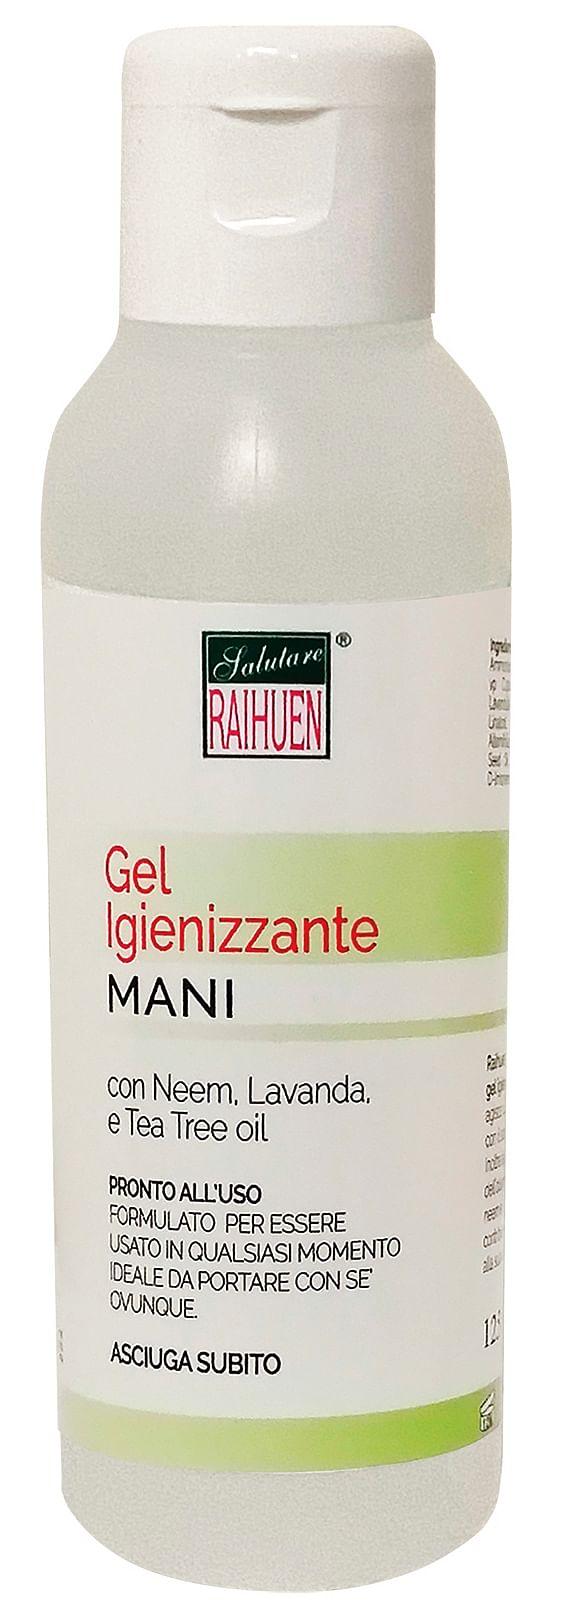 Raihuen gel igienizzante mani 100 ml